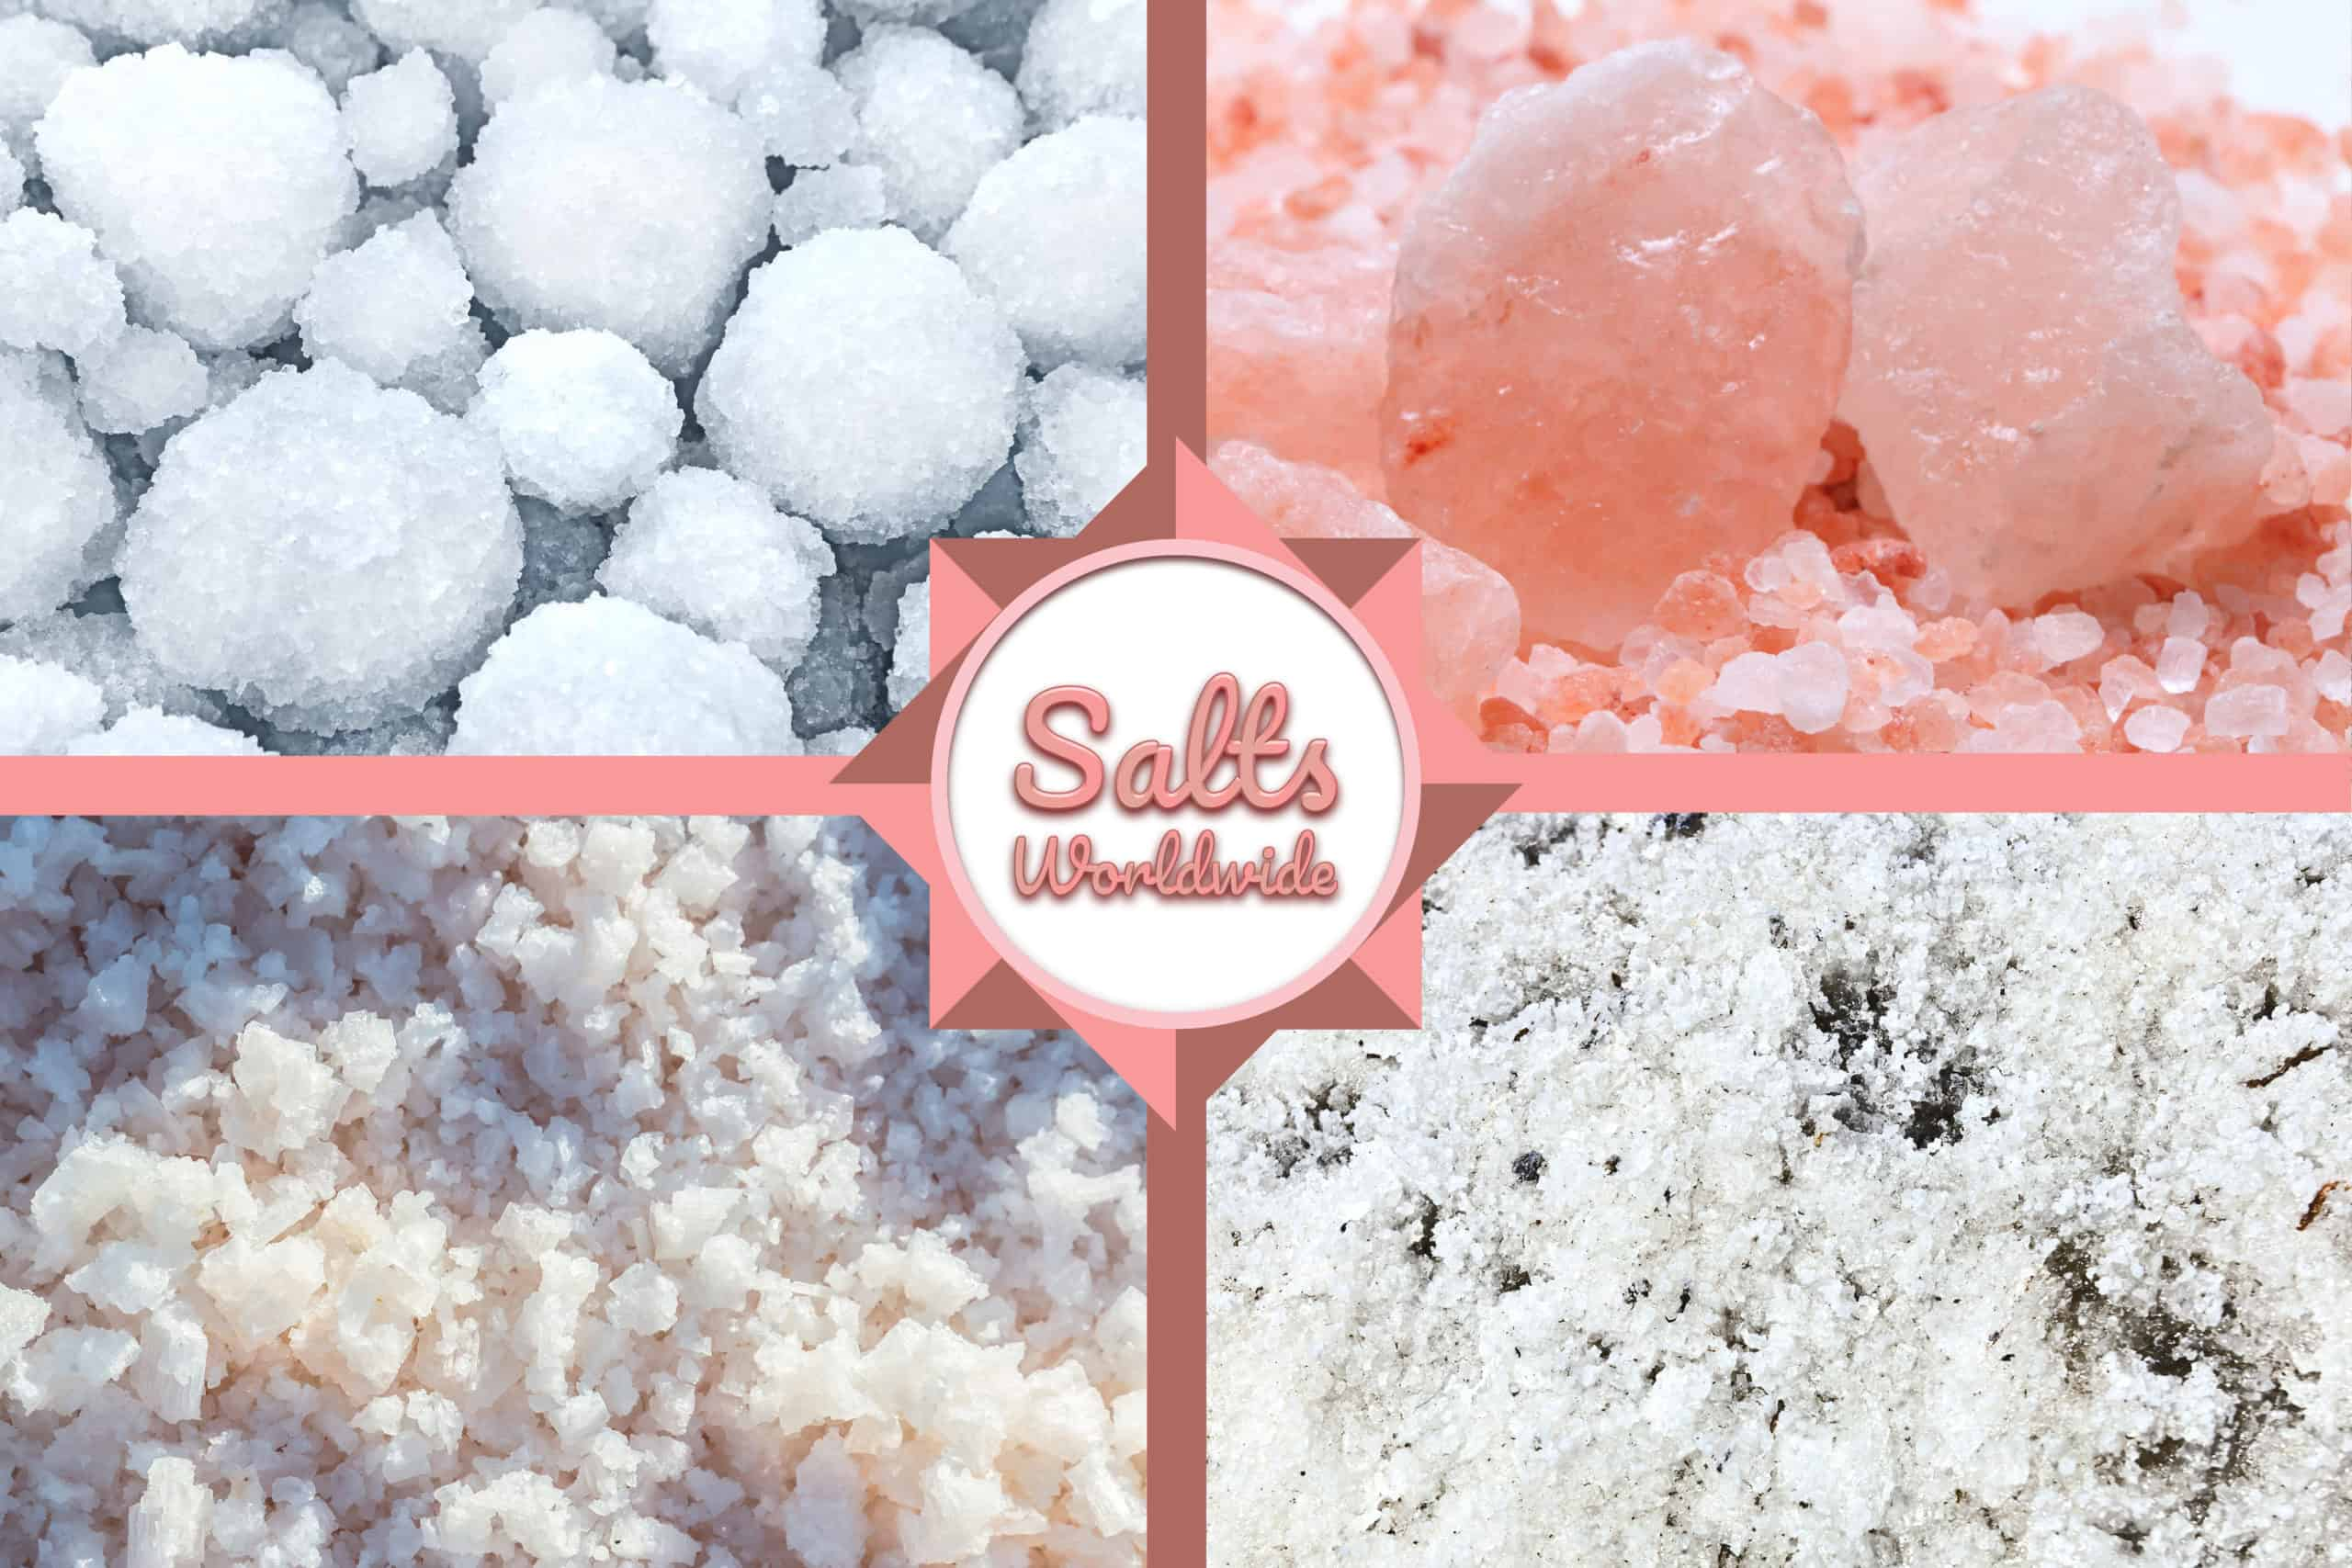 Salty Sampler